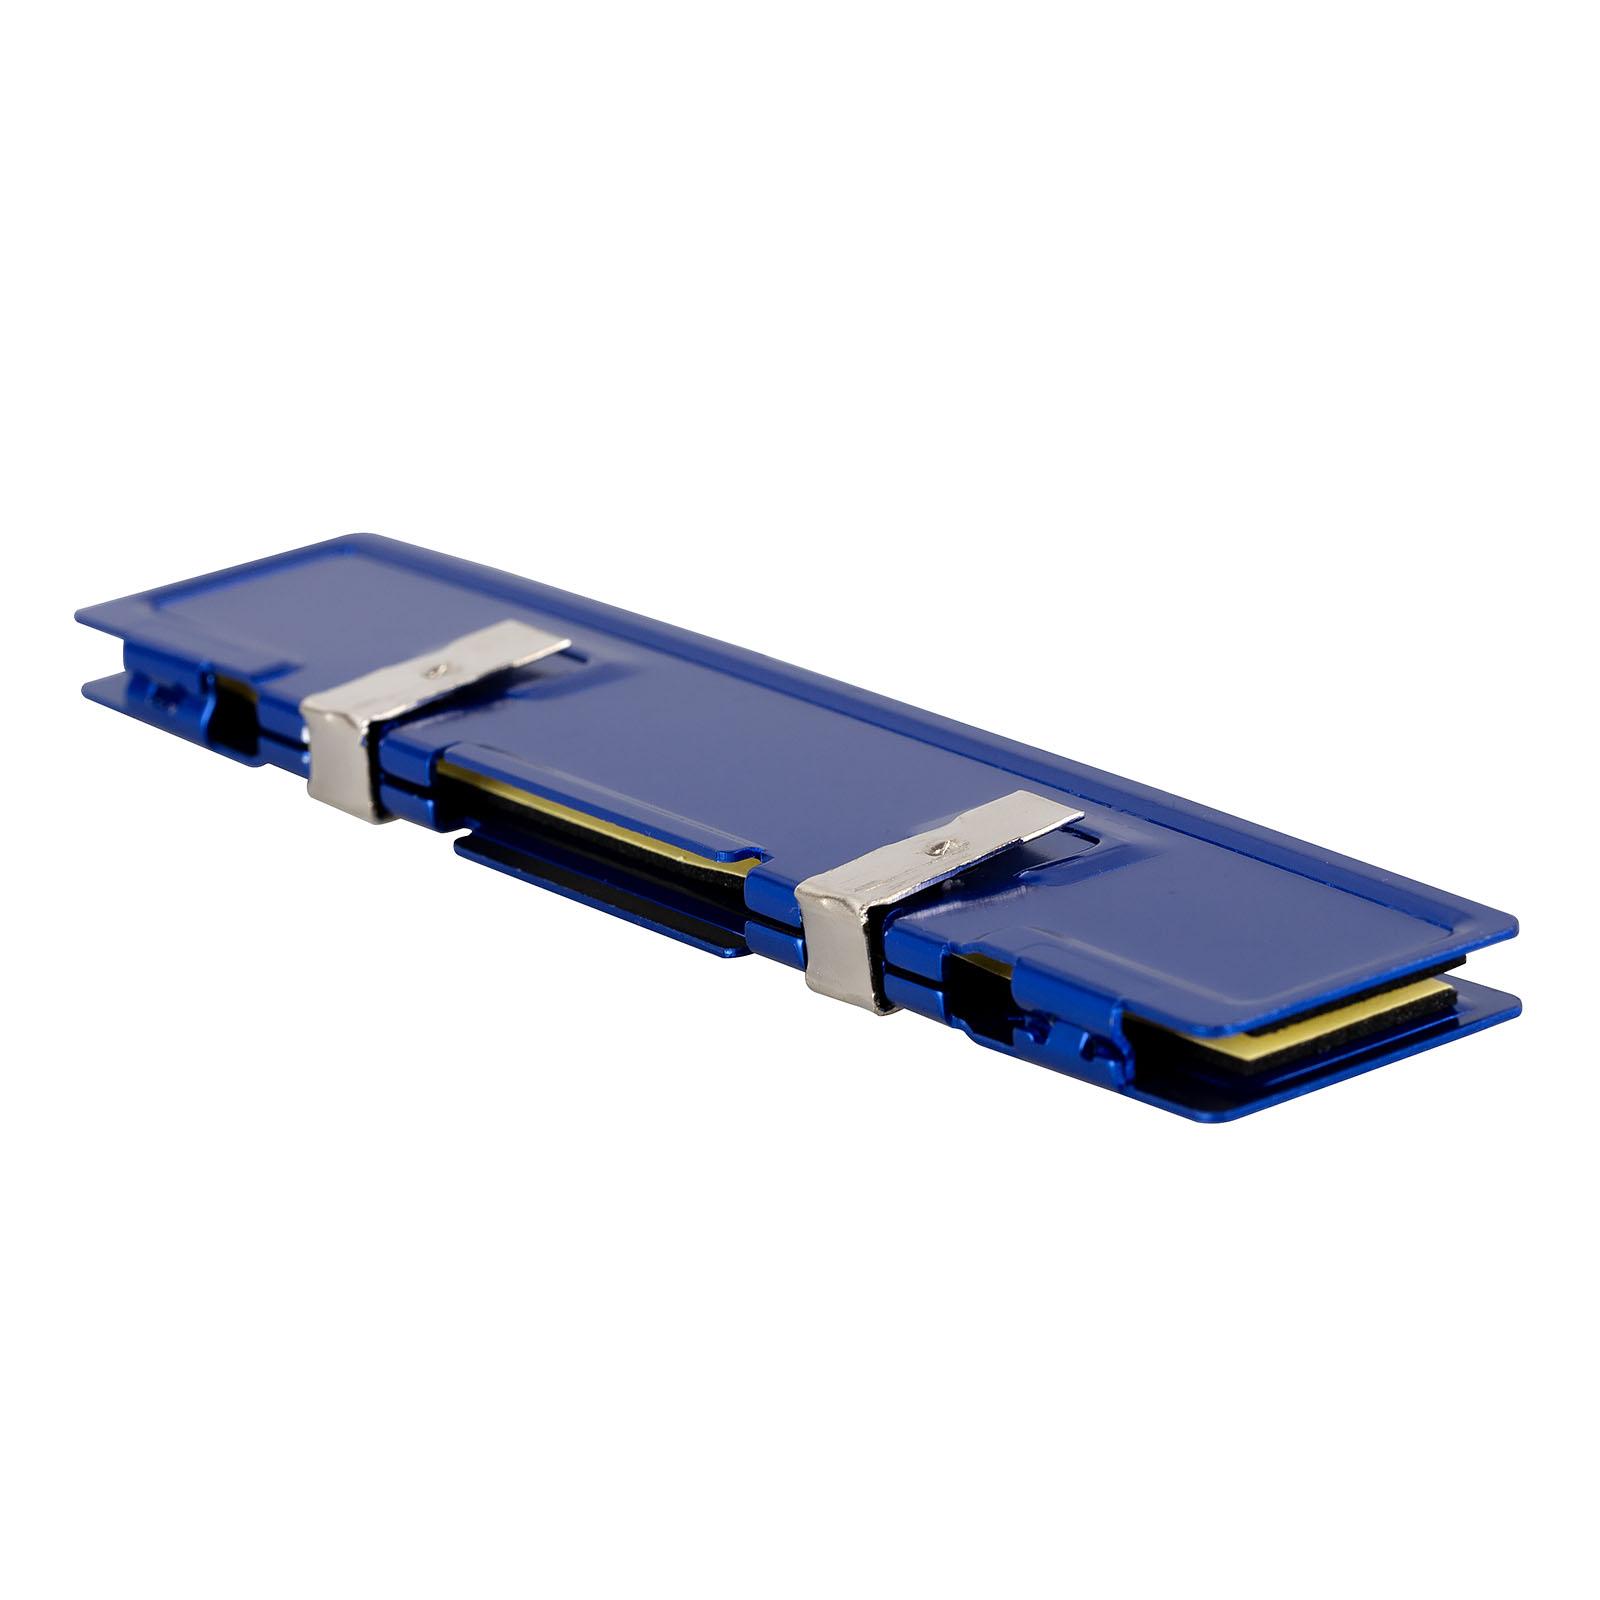 2pcs Desktop PC RAM Heatsink Cooling Clip DDR4 DDR3 DDR2 Memory Chip Aluminum